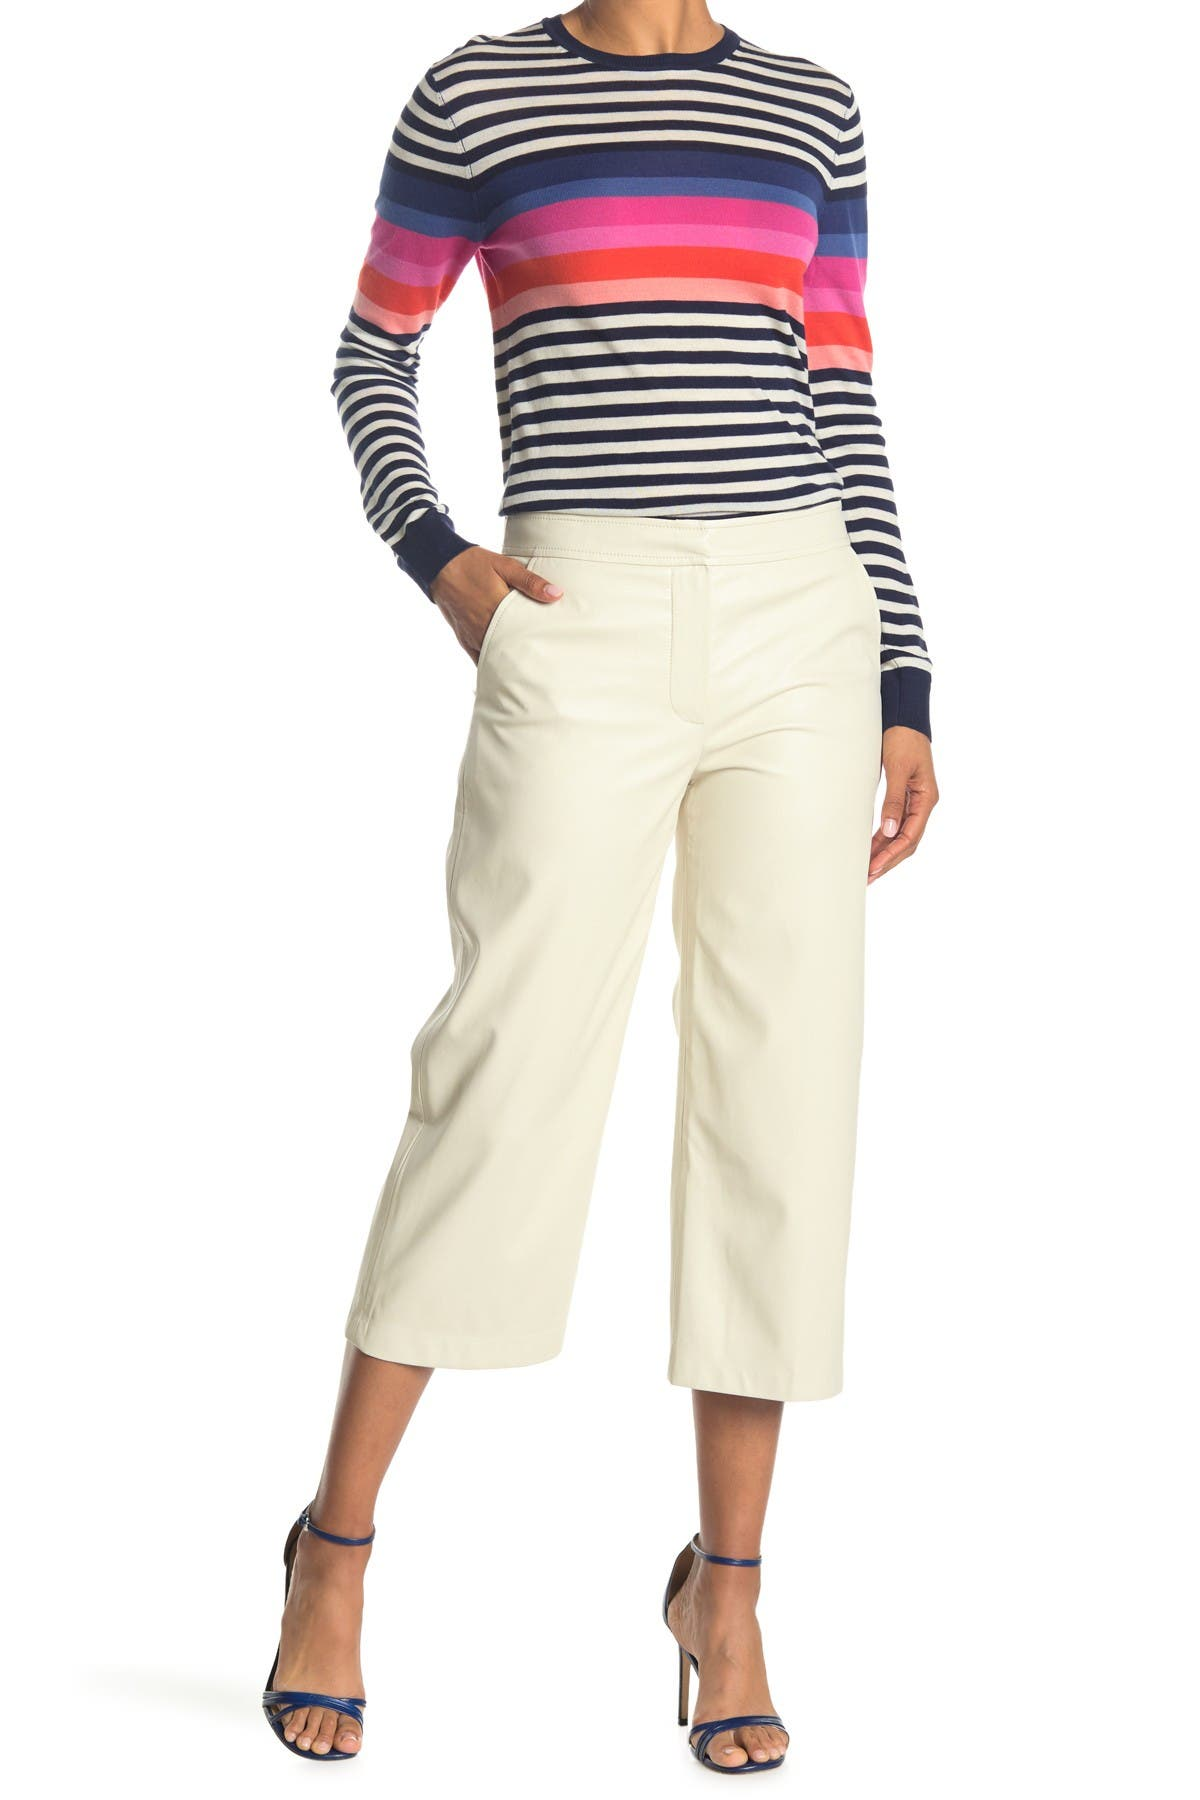 Image of Trina Turk Shae Culotte Pants